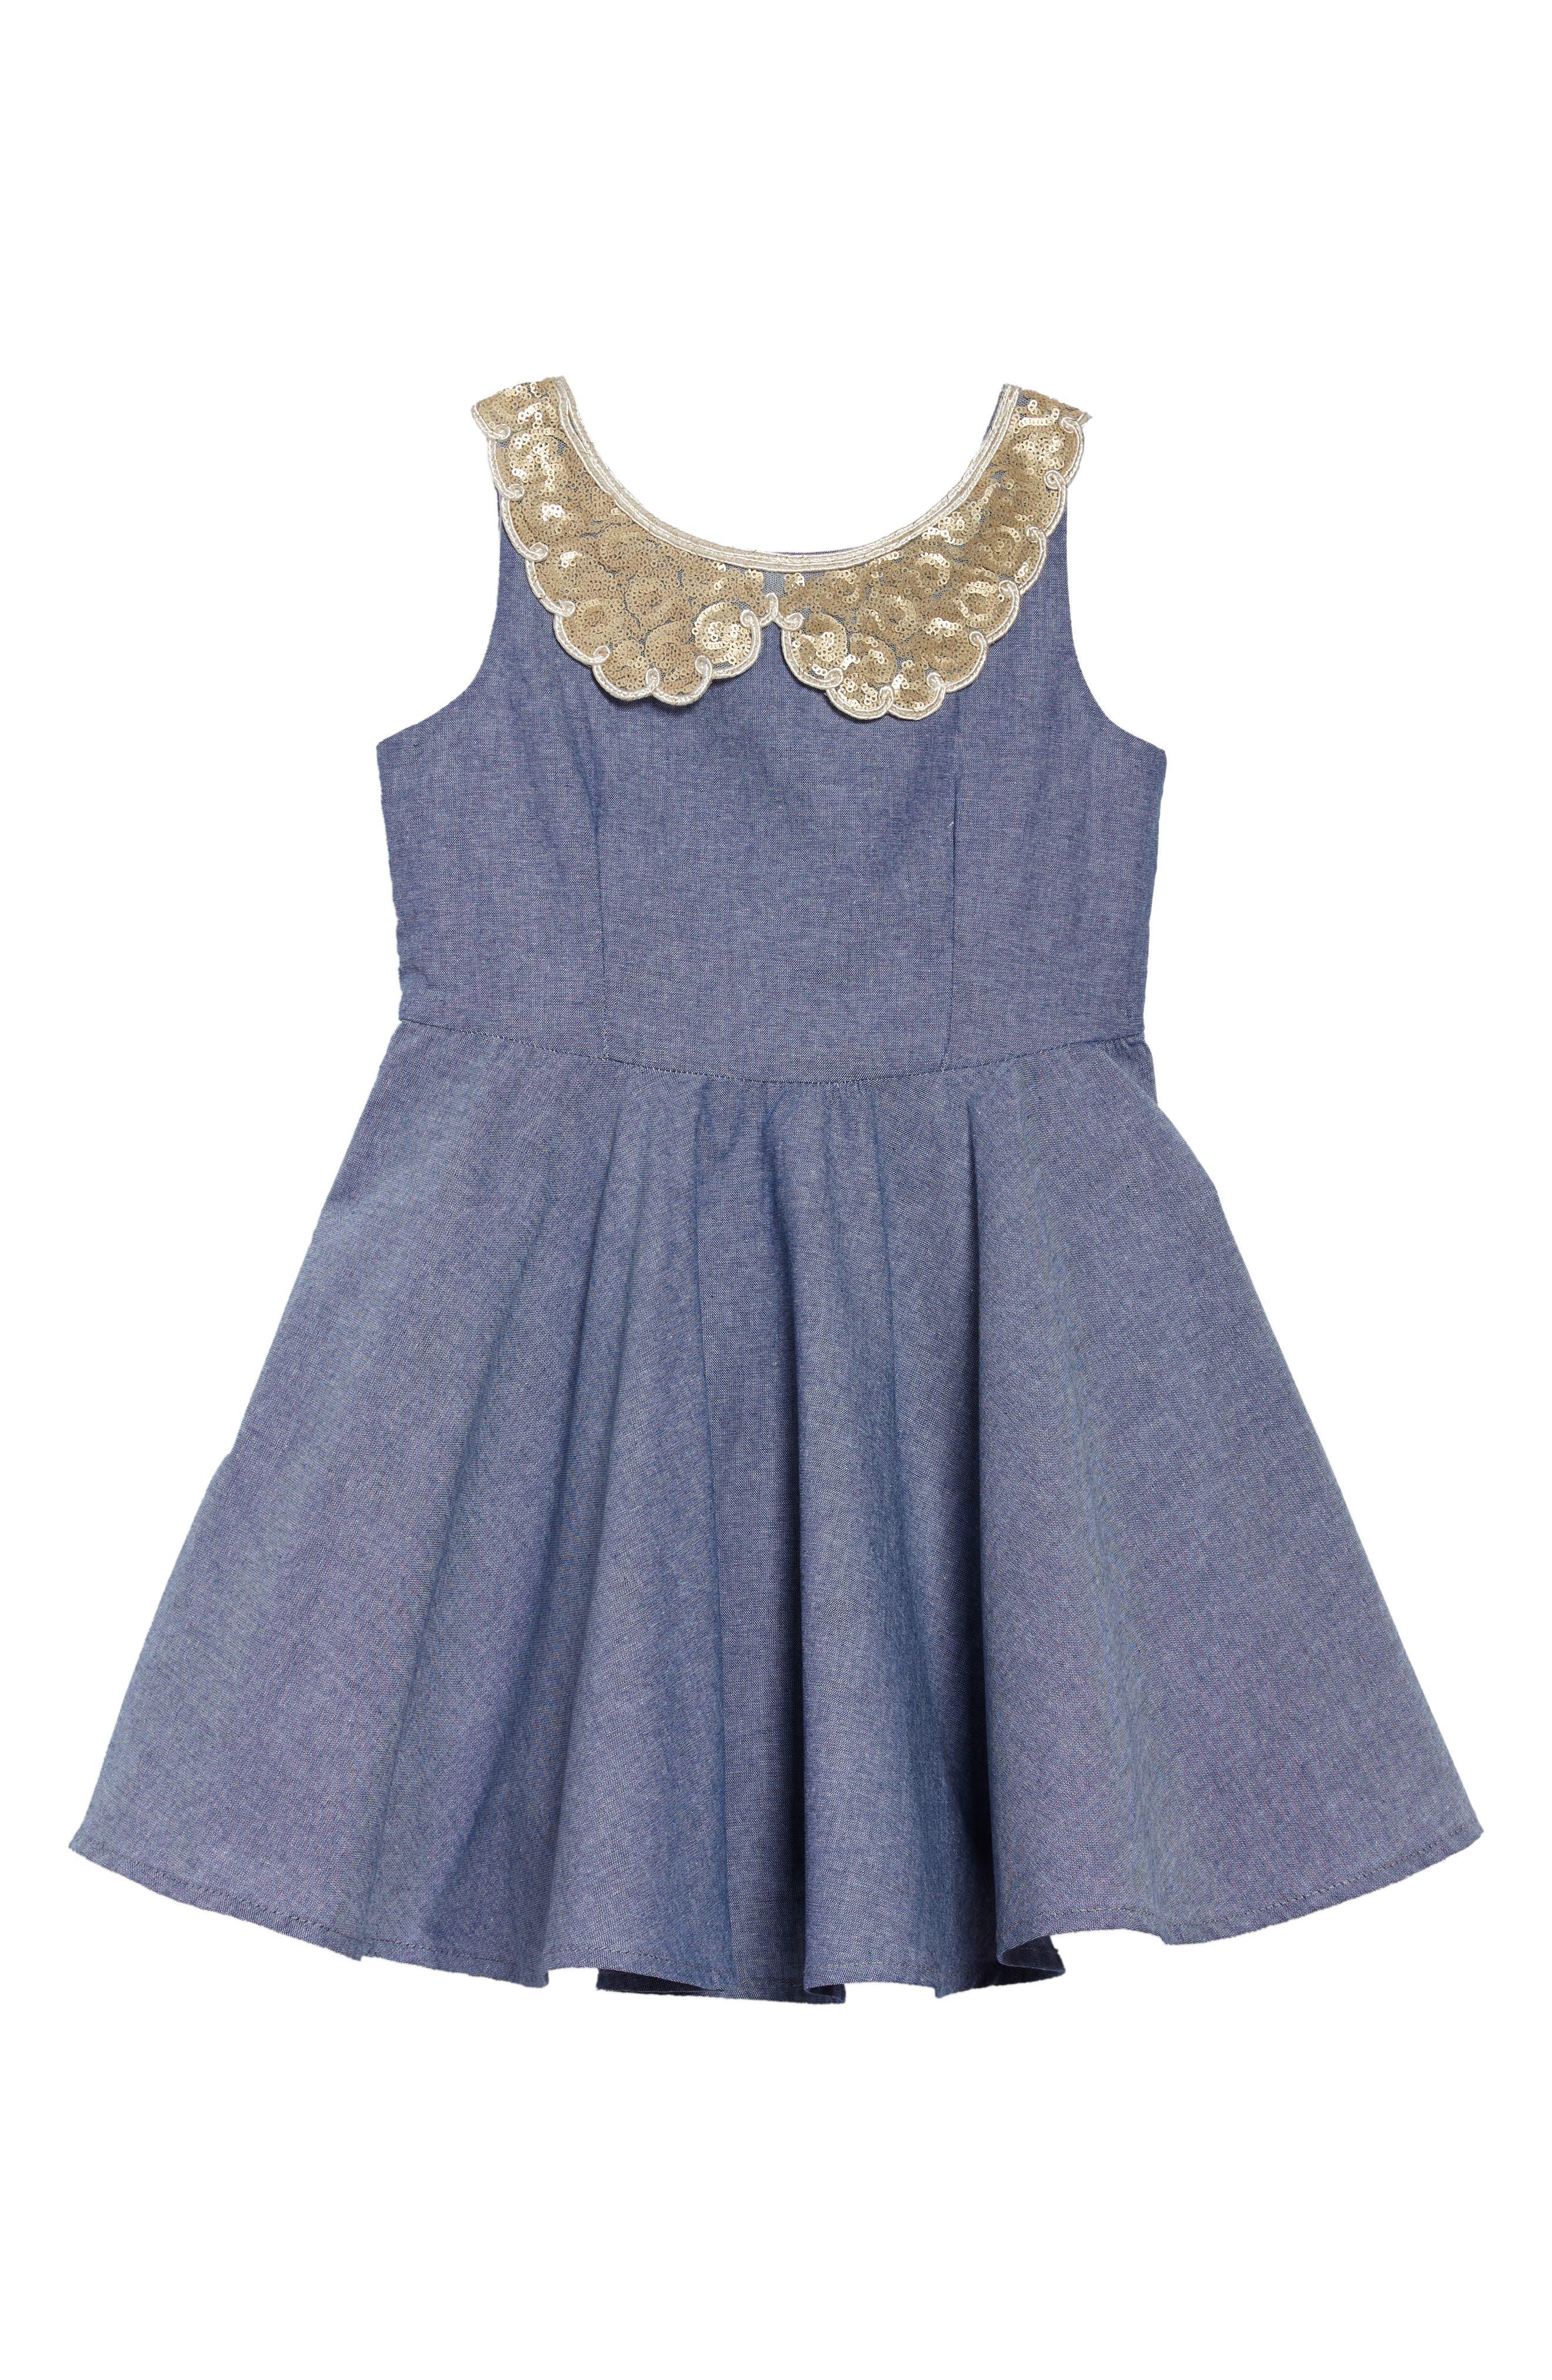 Darcy Chambray Dress,                         Main,                         color, 400